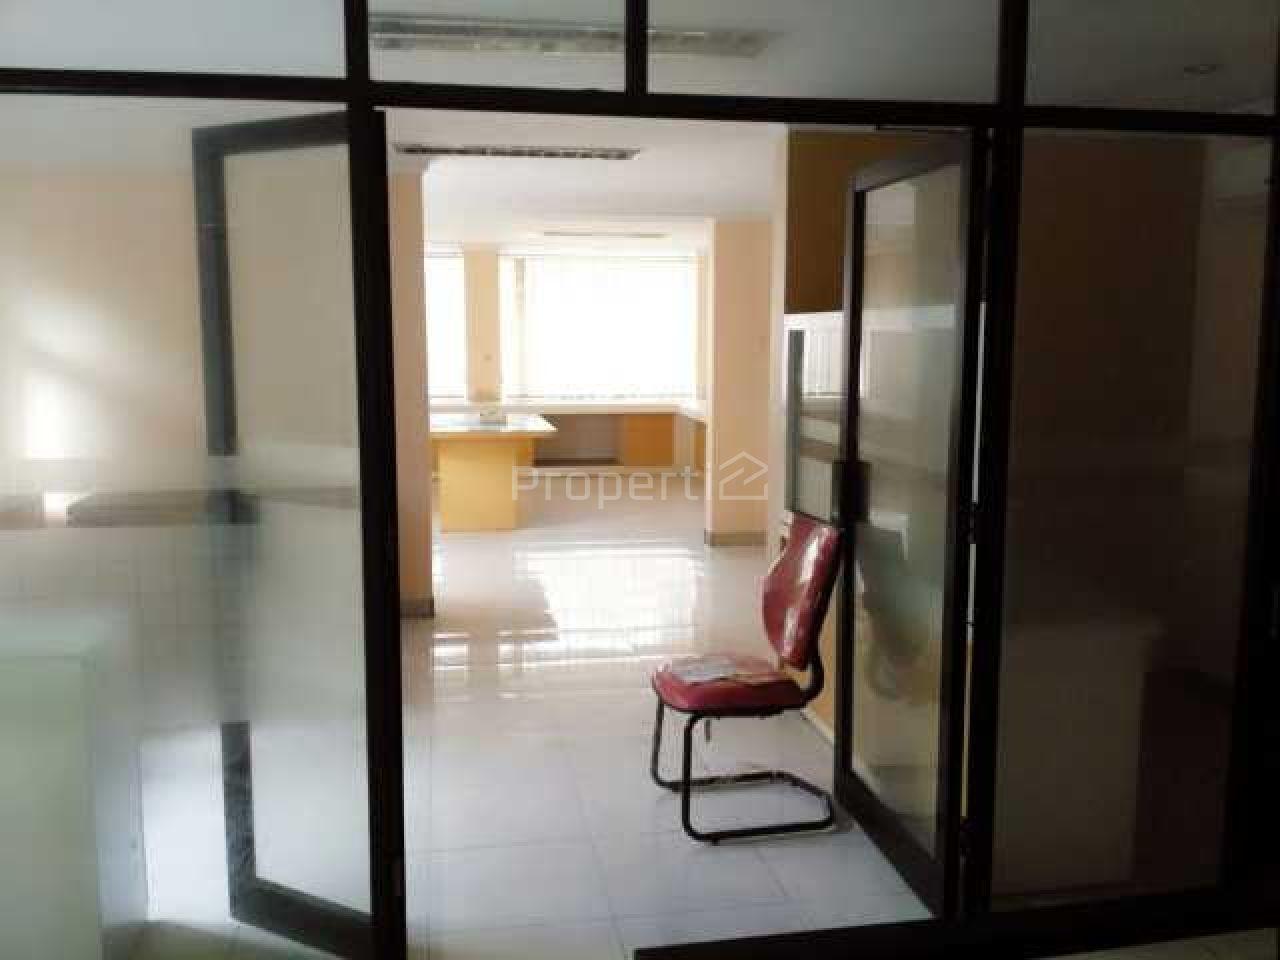 Gedung Kantor Unfinished di Matraman, Jakarta Timur